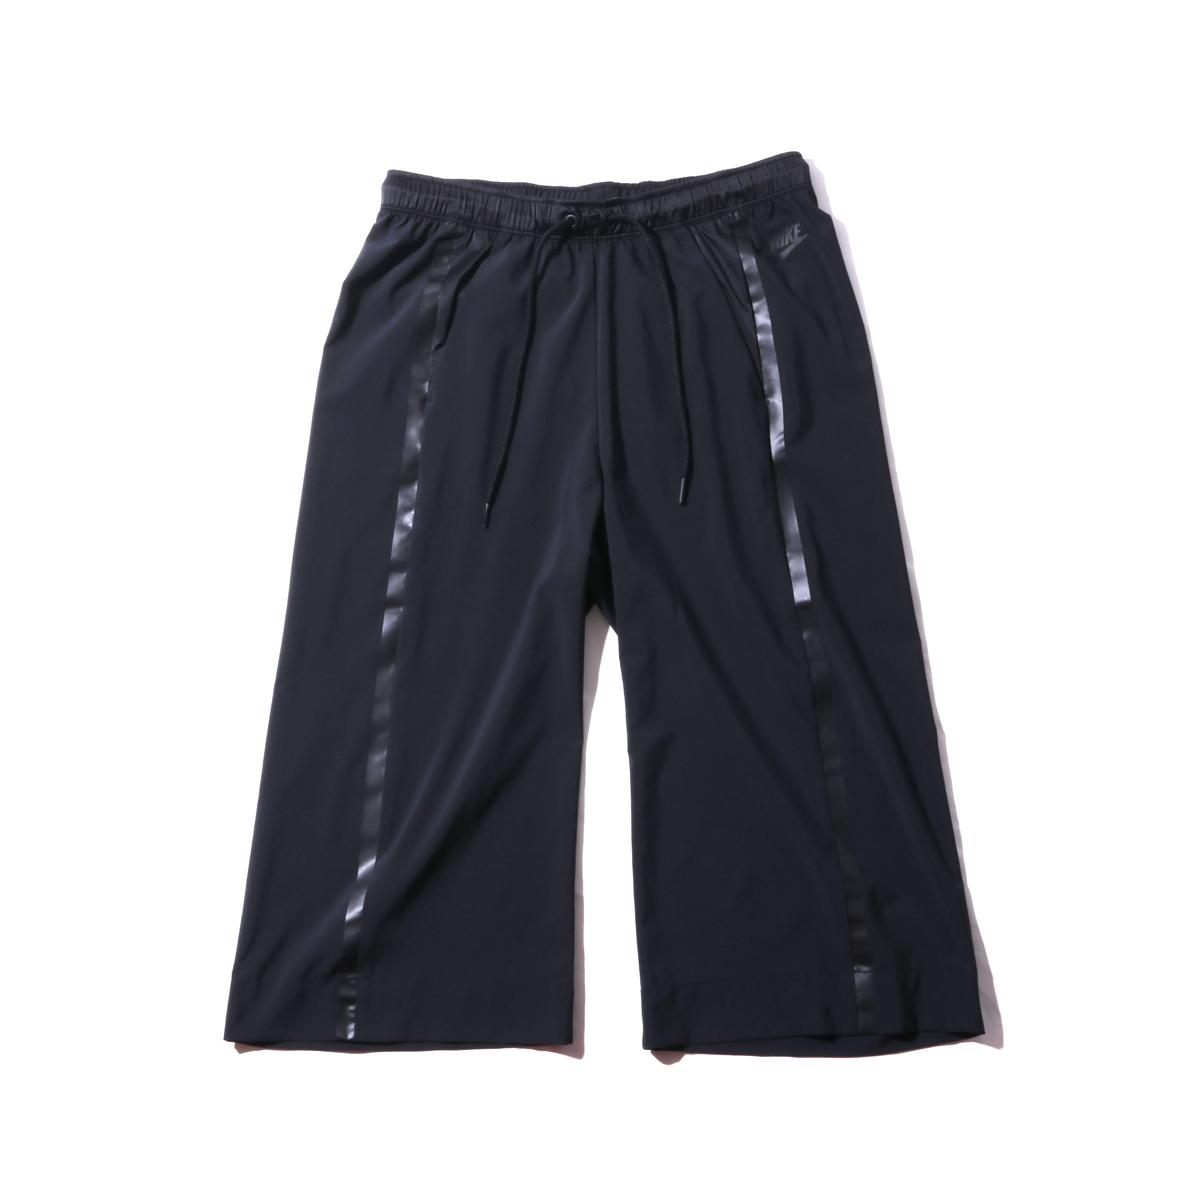 NIKE WMNS CAPRI BONDED WOVEN PANT(BLACK)(ナイキ ウィメンズ ボンデッド ウーブン パンツ)【レディース】【パンツ】【16FA-I】